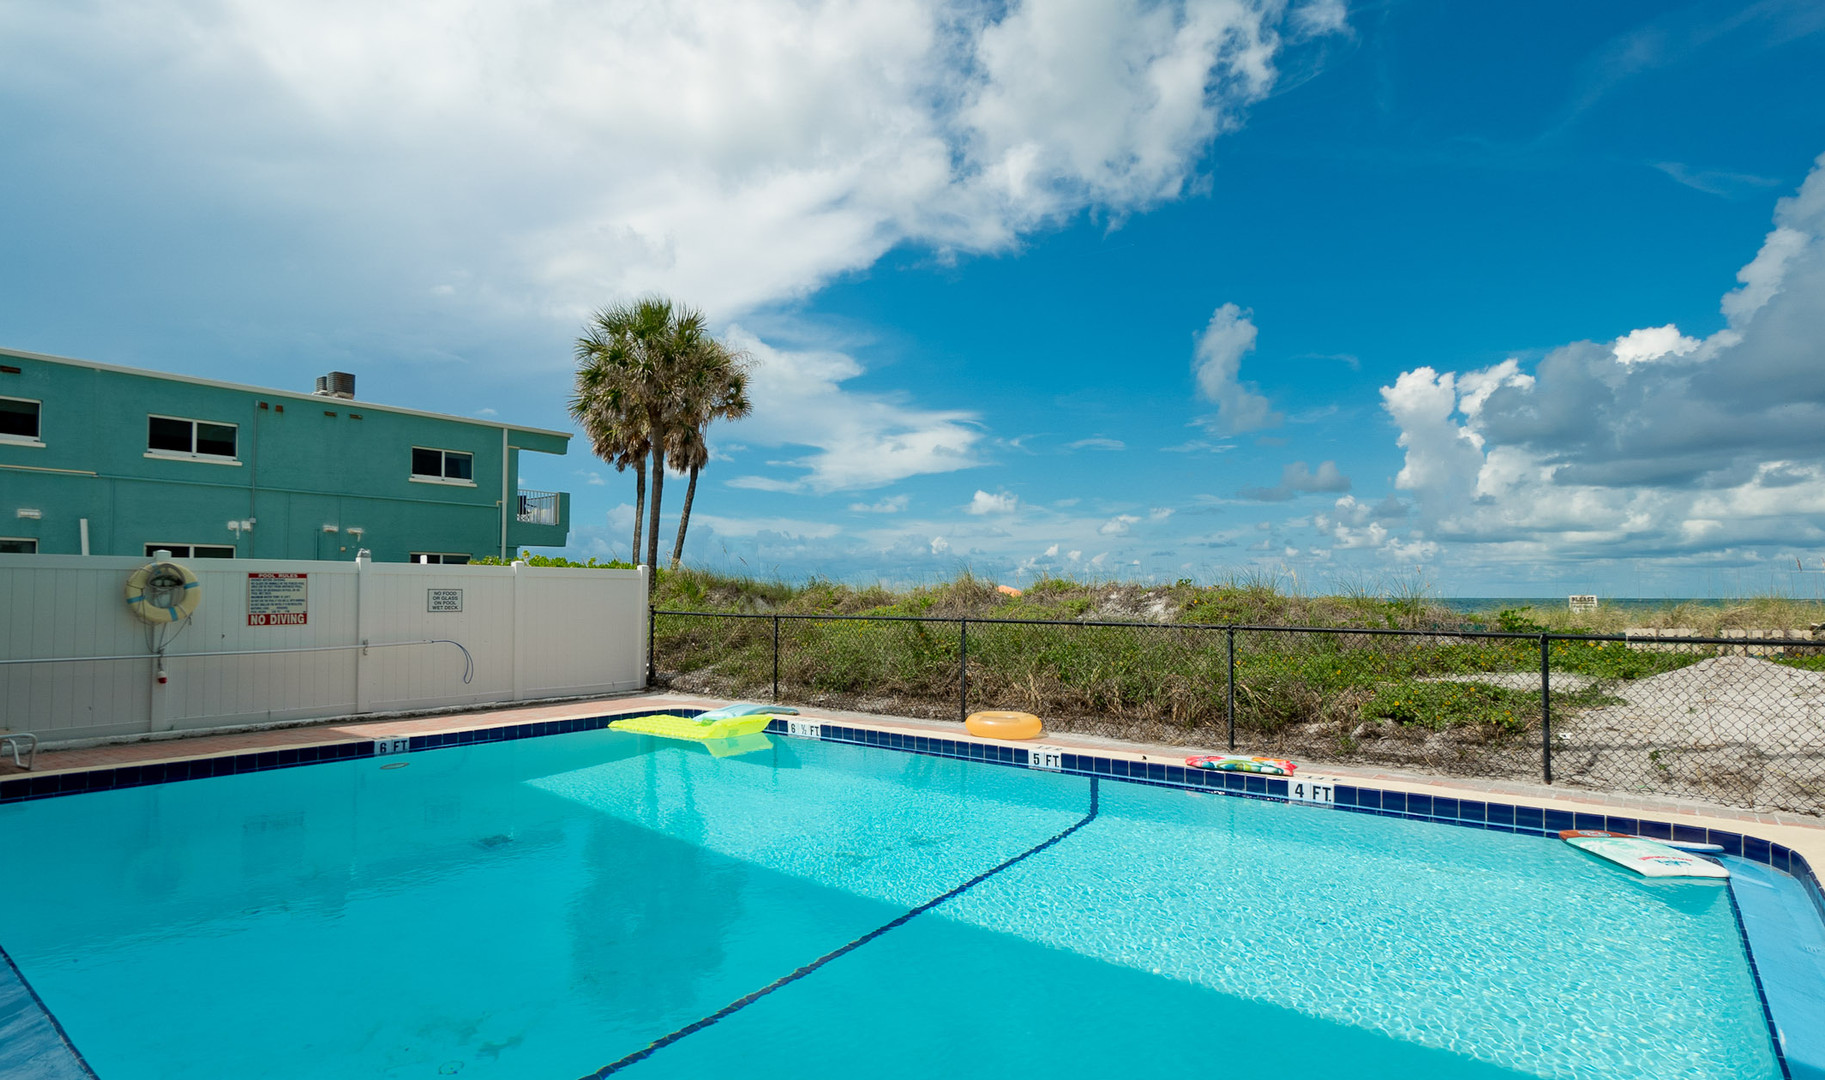 Take a break from the beach poolside